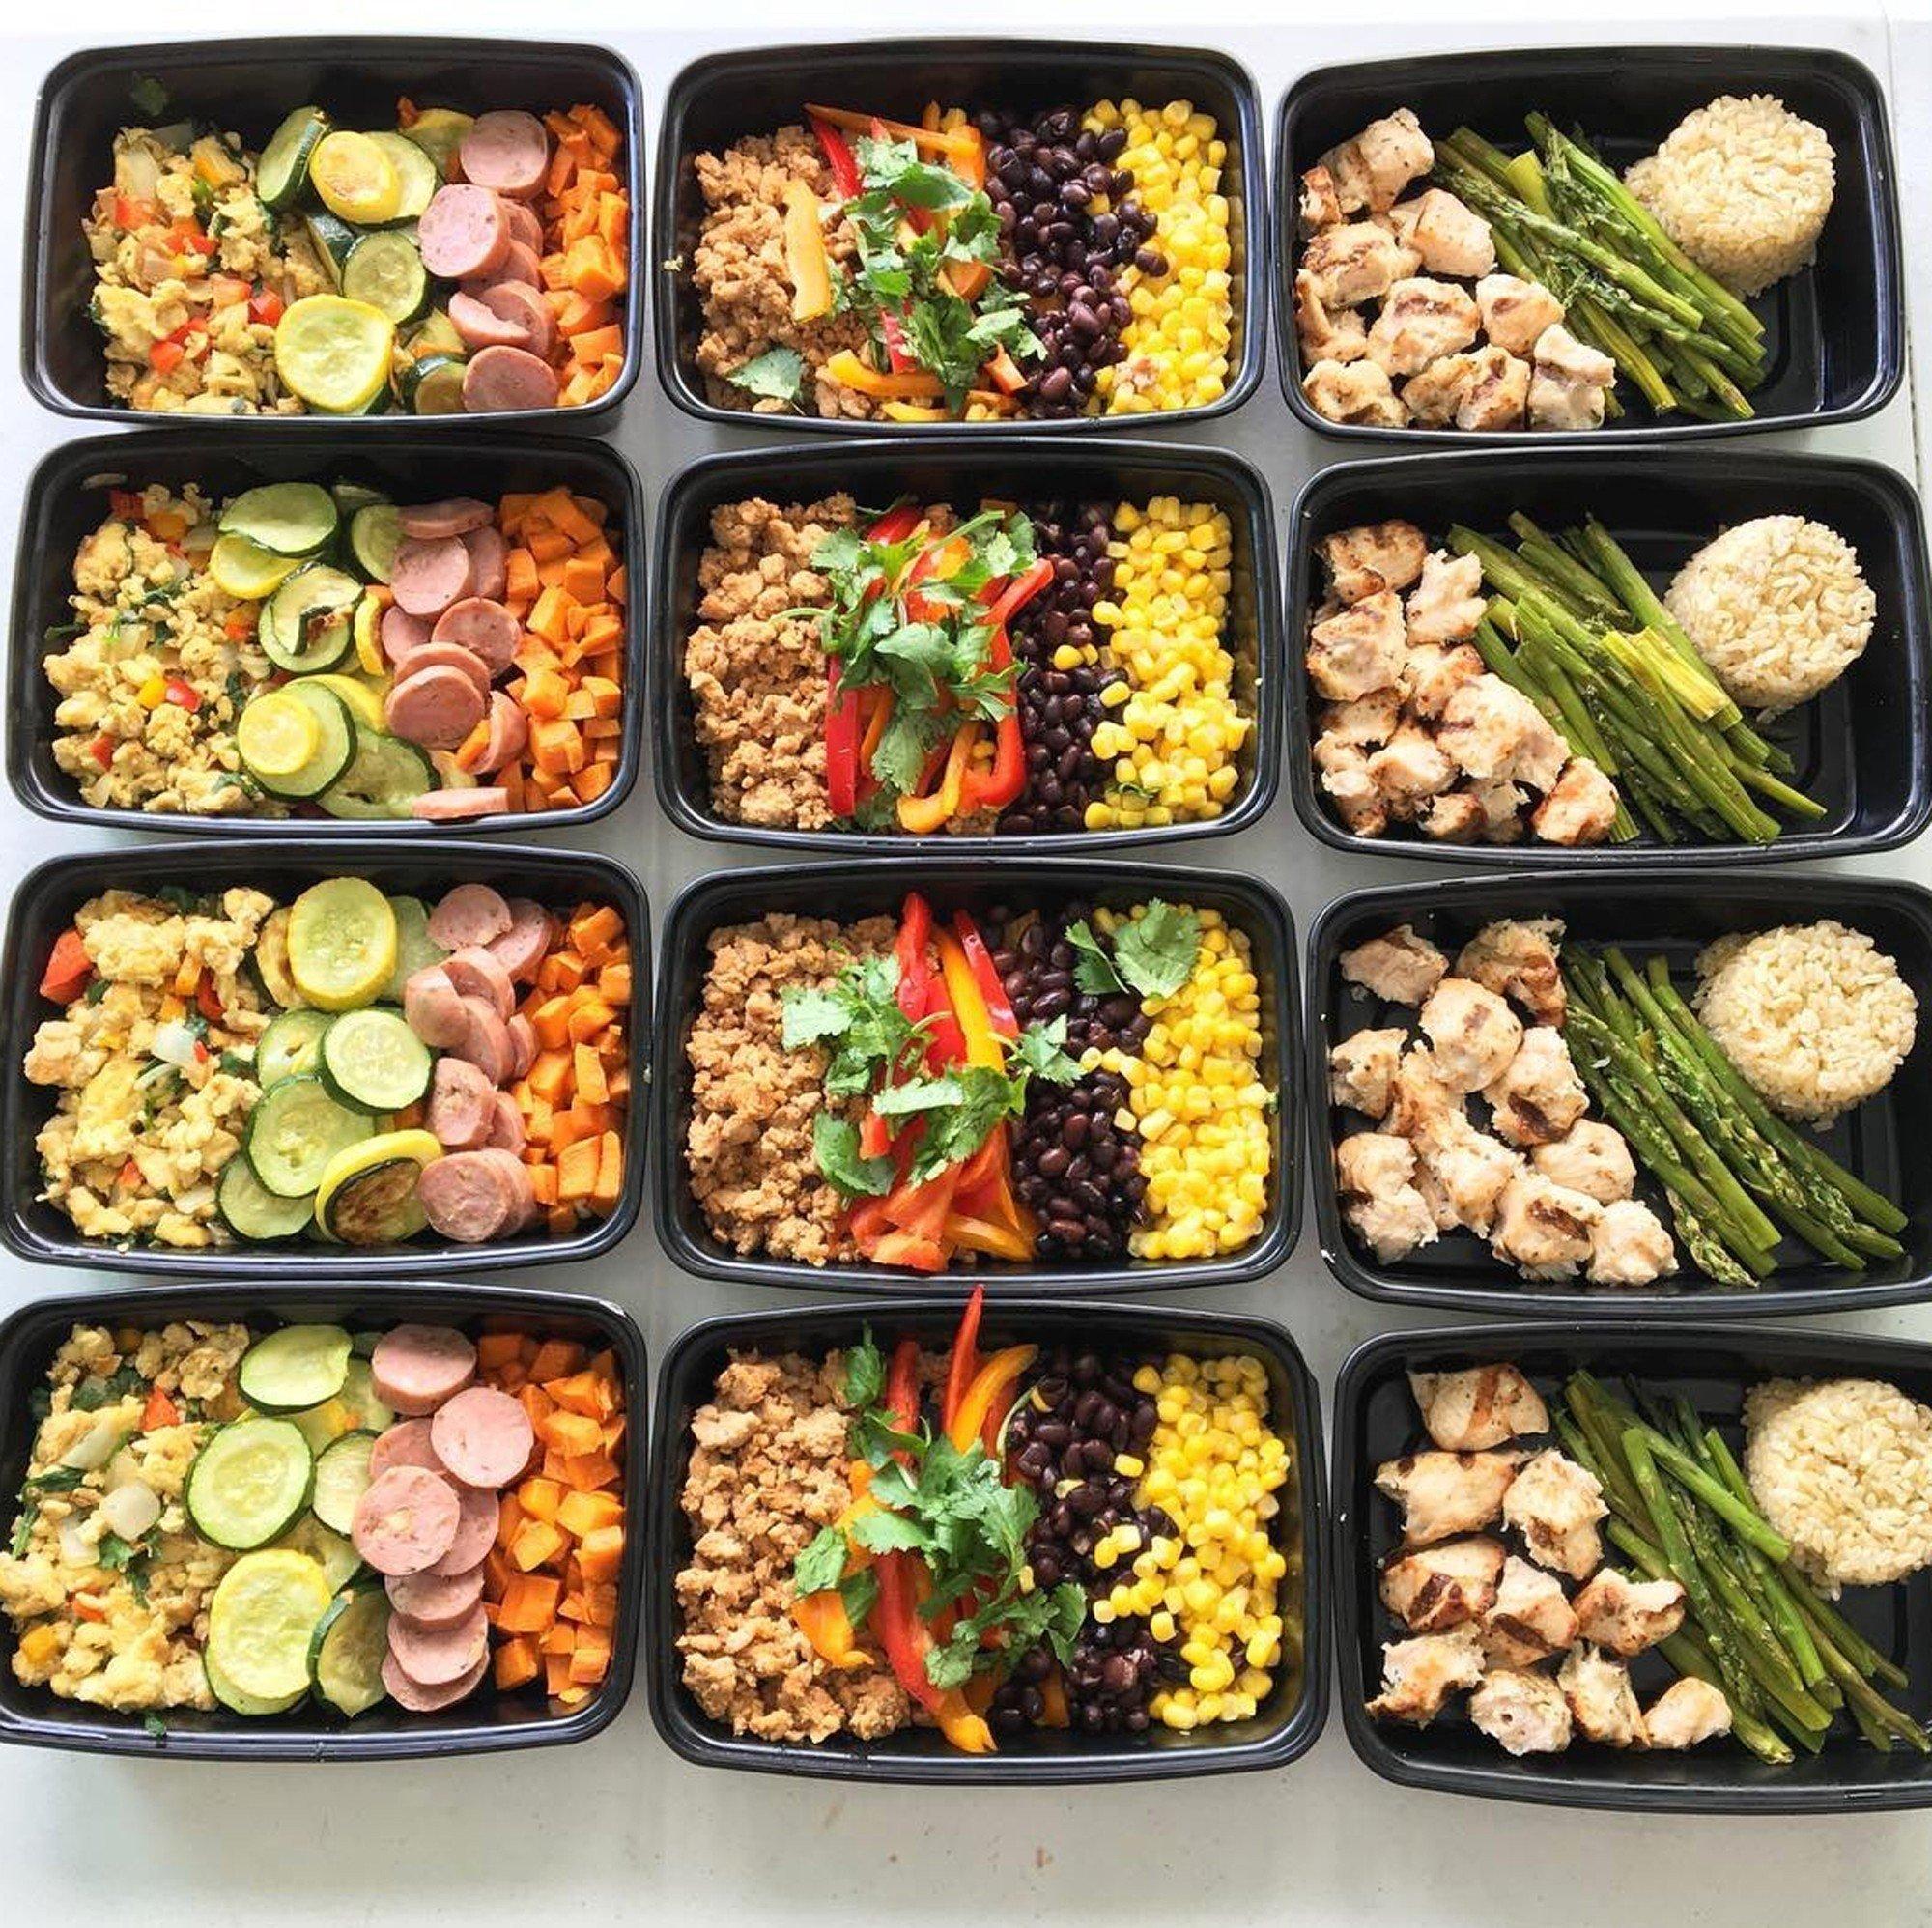 10 Pretty Clean Eating Meal Prep Ideas burrito bowl meal prep ideas popsugar fitness 2020